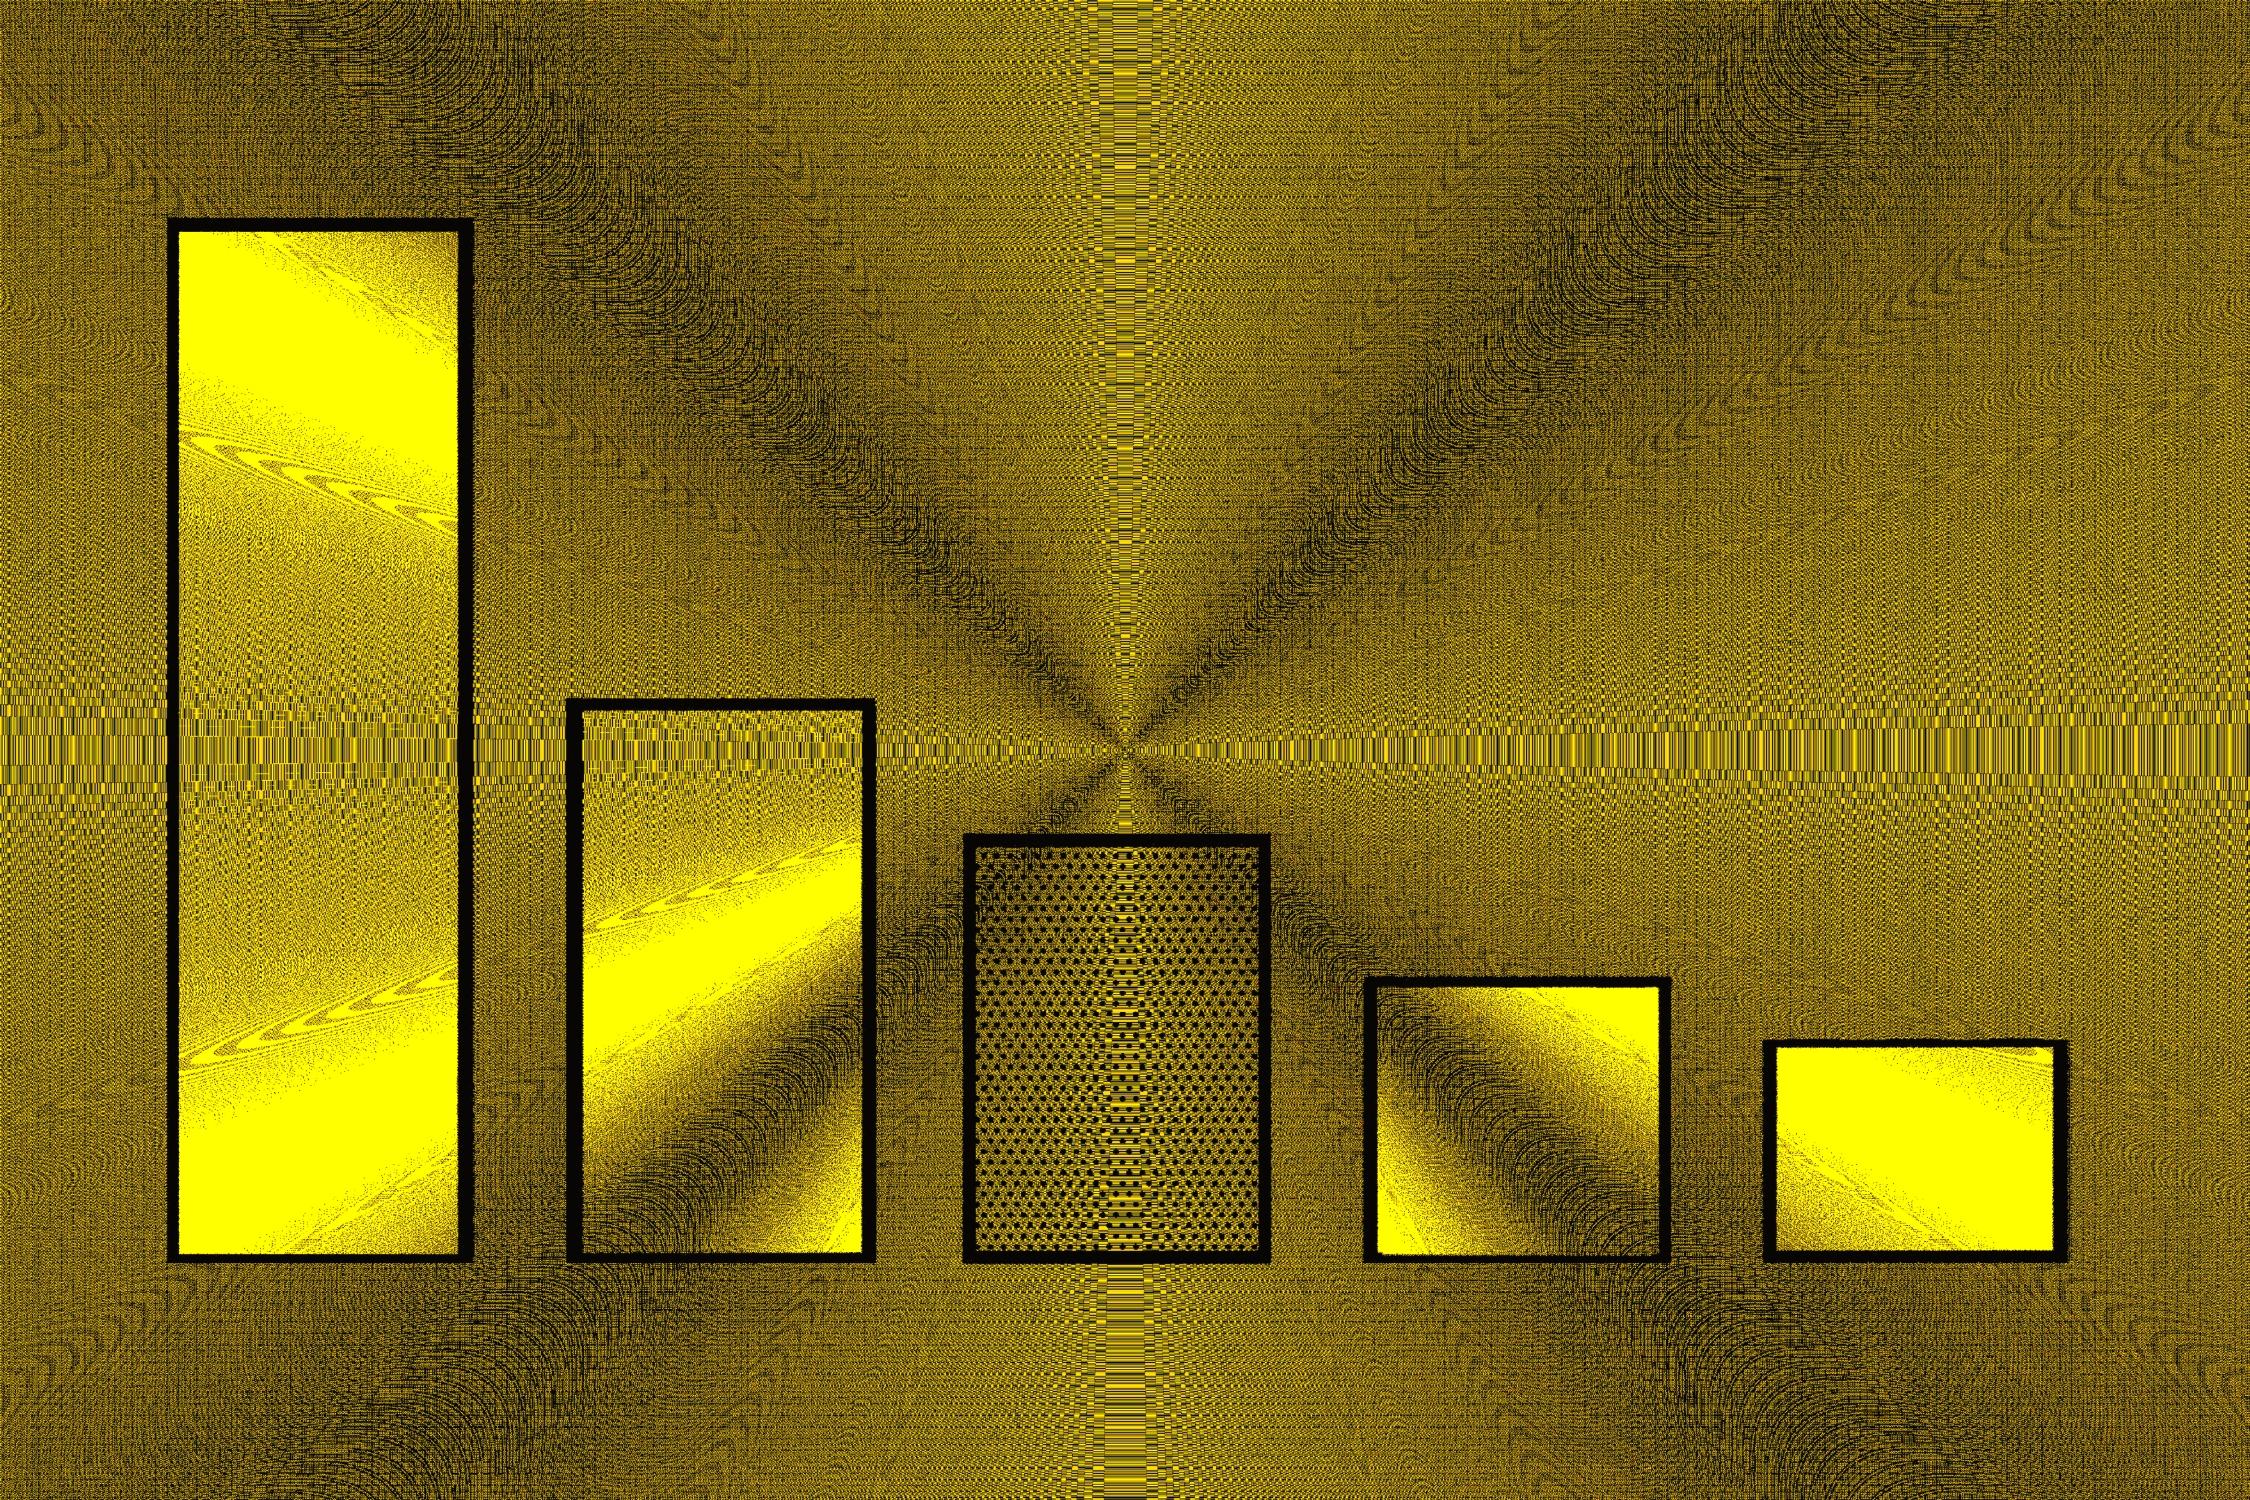 Dec16 final orangegold palette lighter  mosaic participating countries words inverted sphere 30x30 no filter.jpg copy.jpg